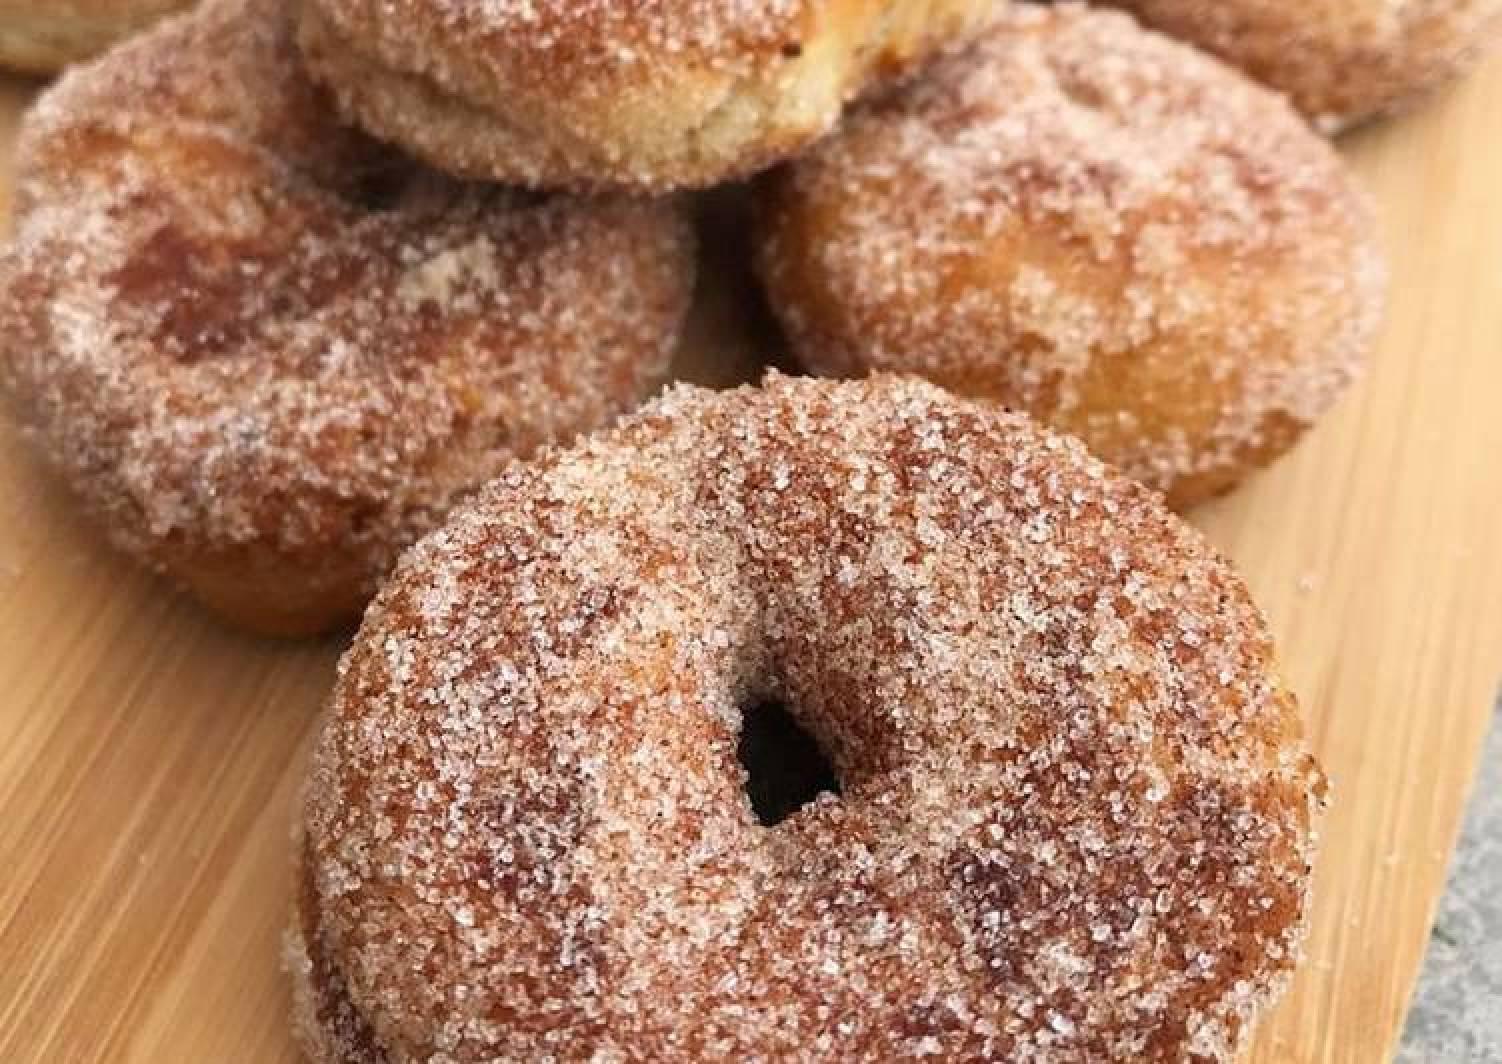 Quick Cinnamon Sugar Doughnuts (Egg & Dairy Free & No Yeast)